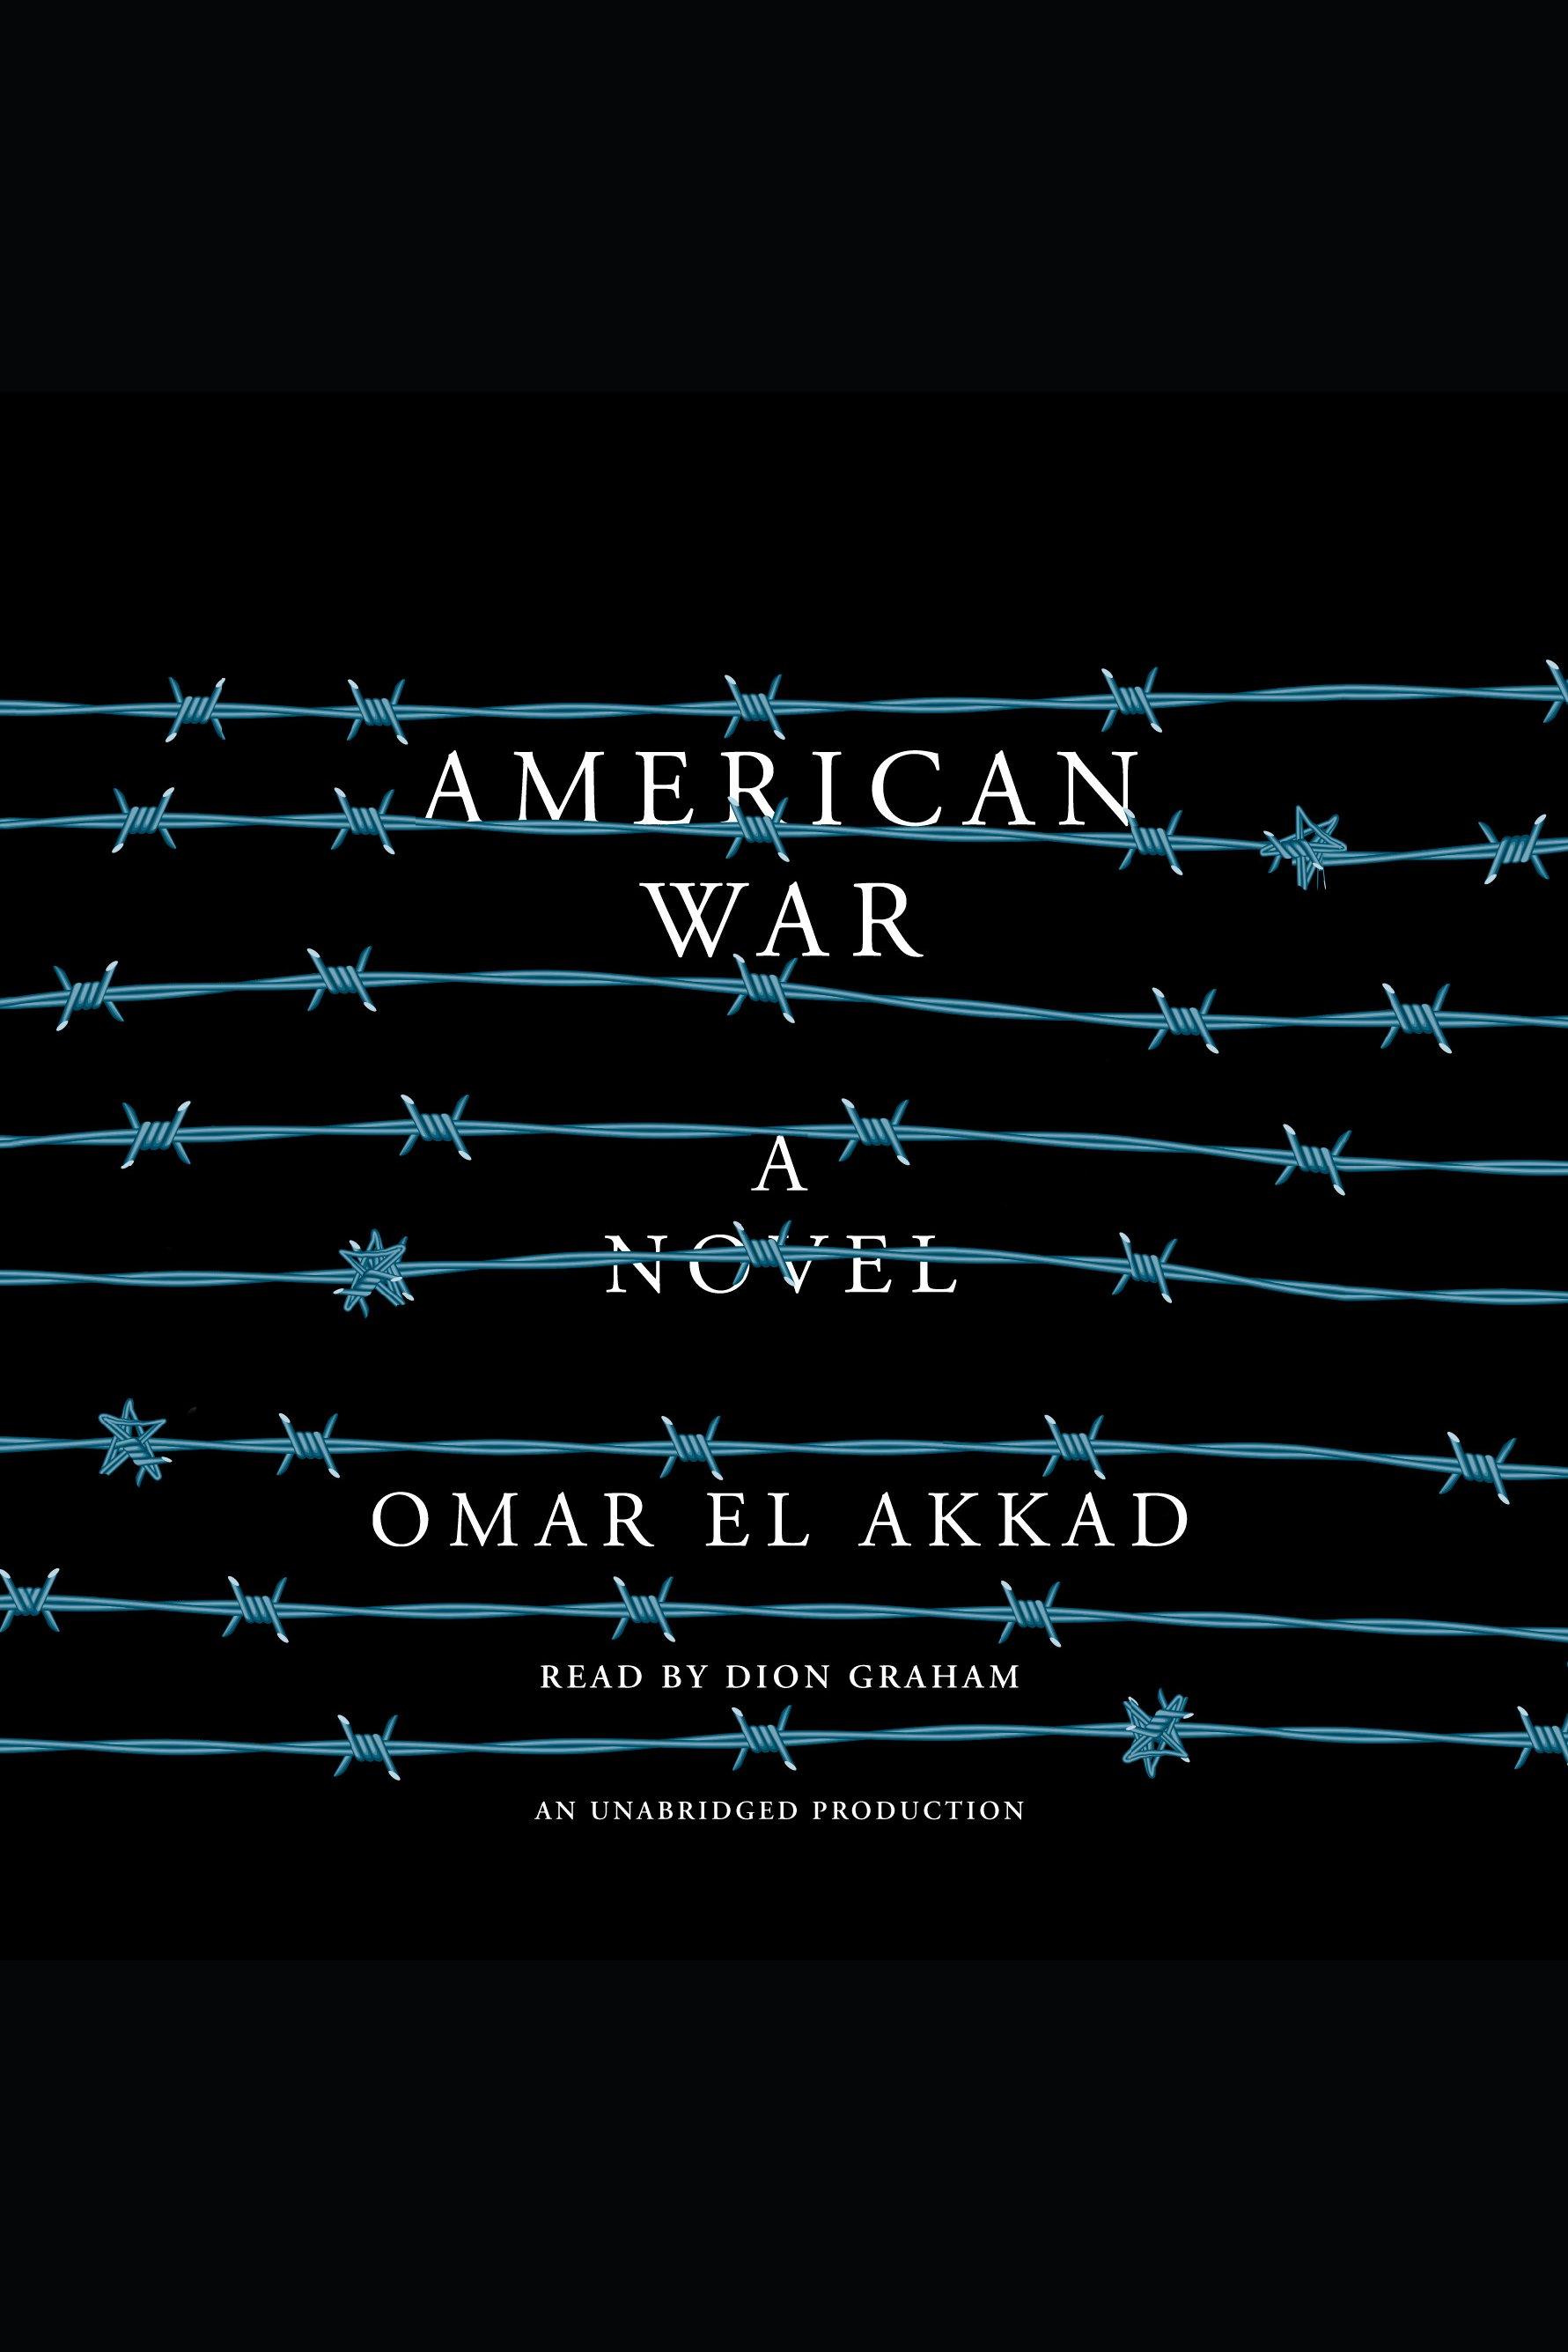 American War cover image